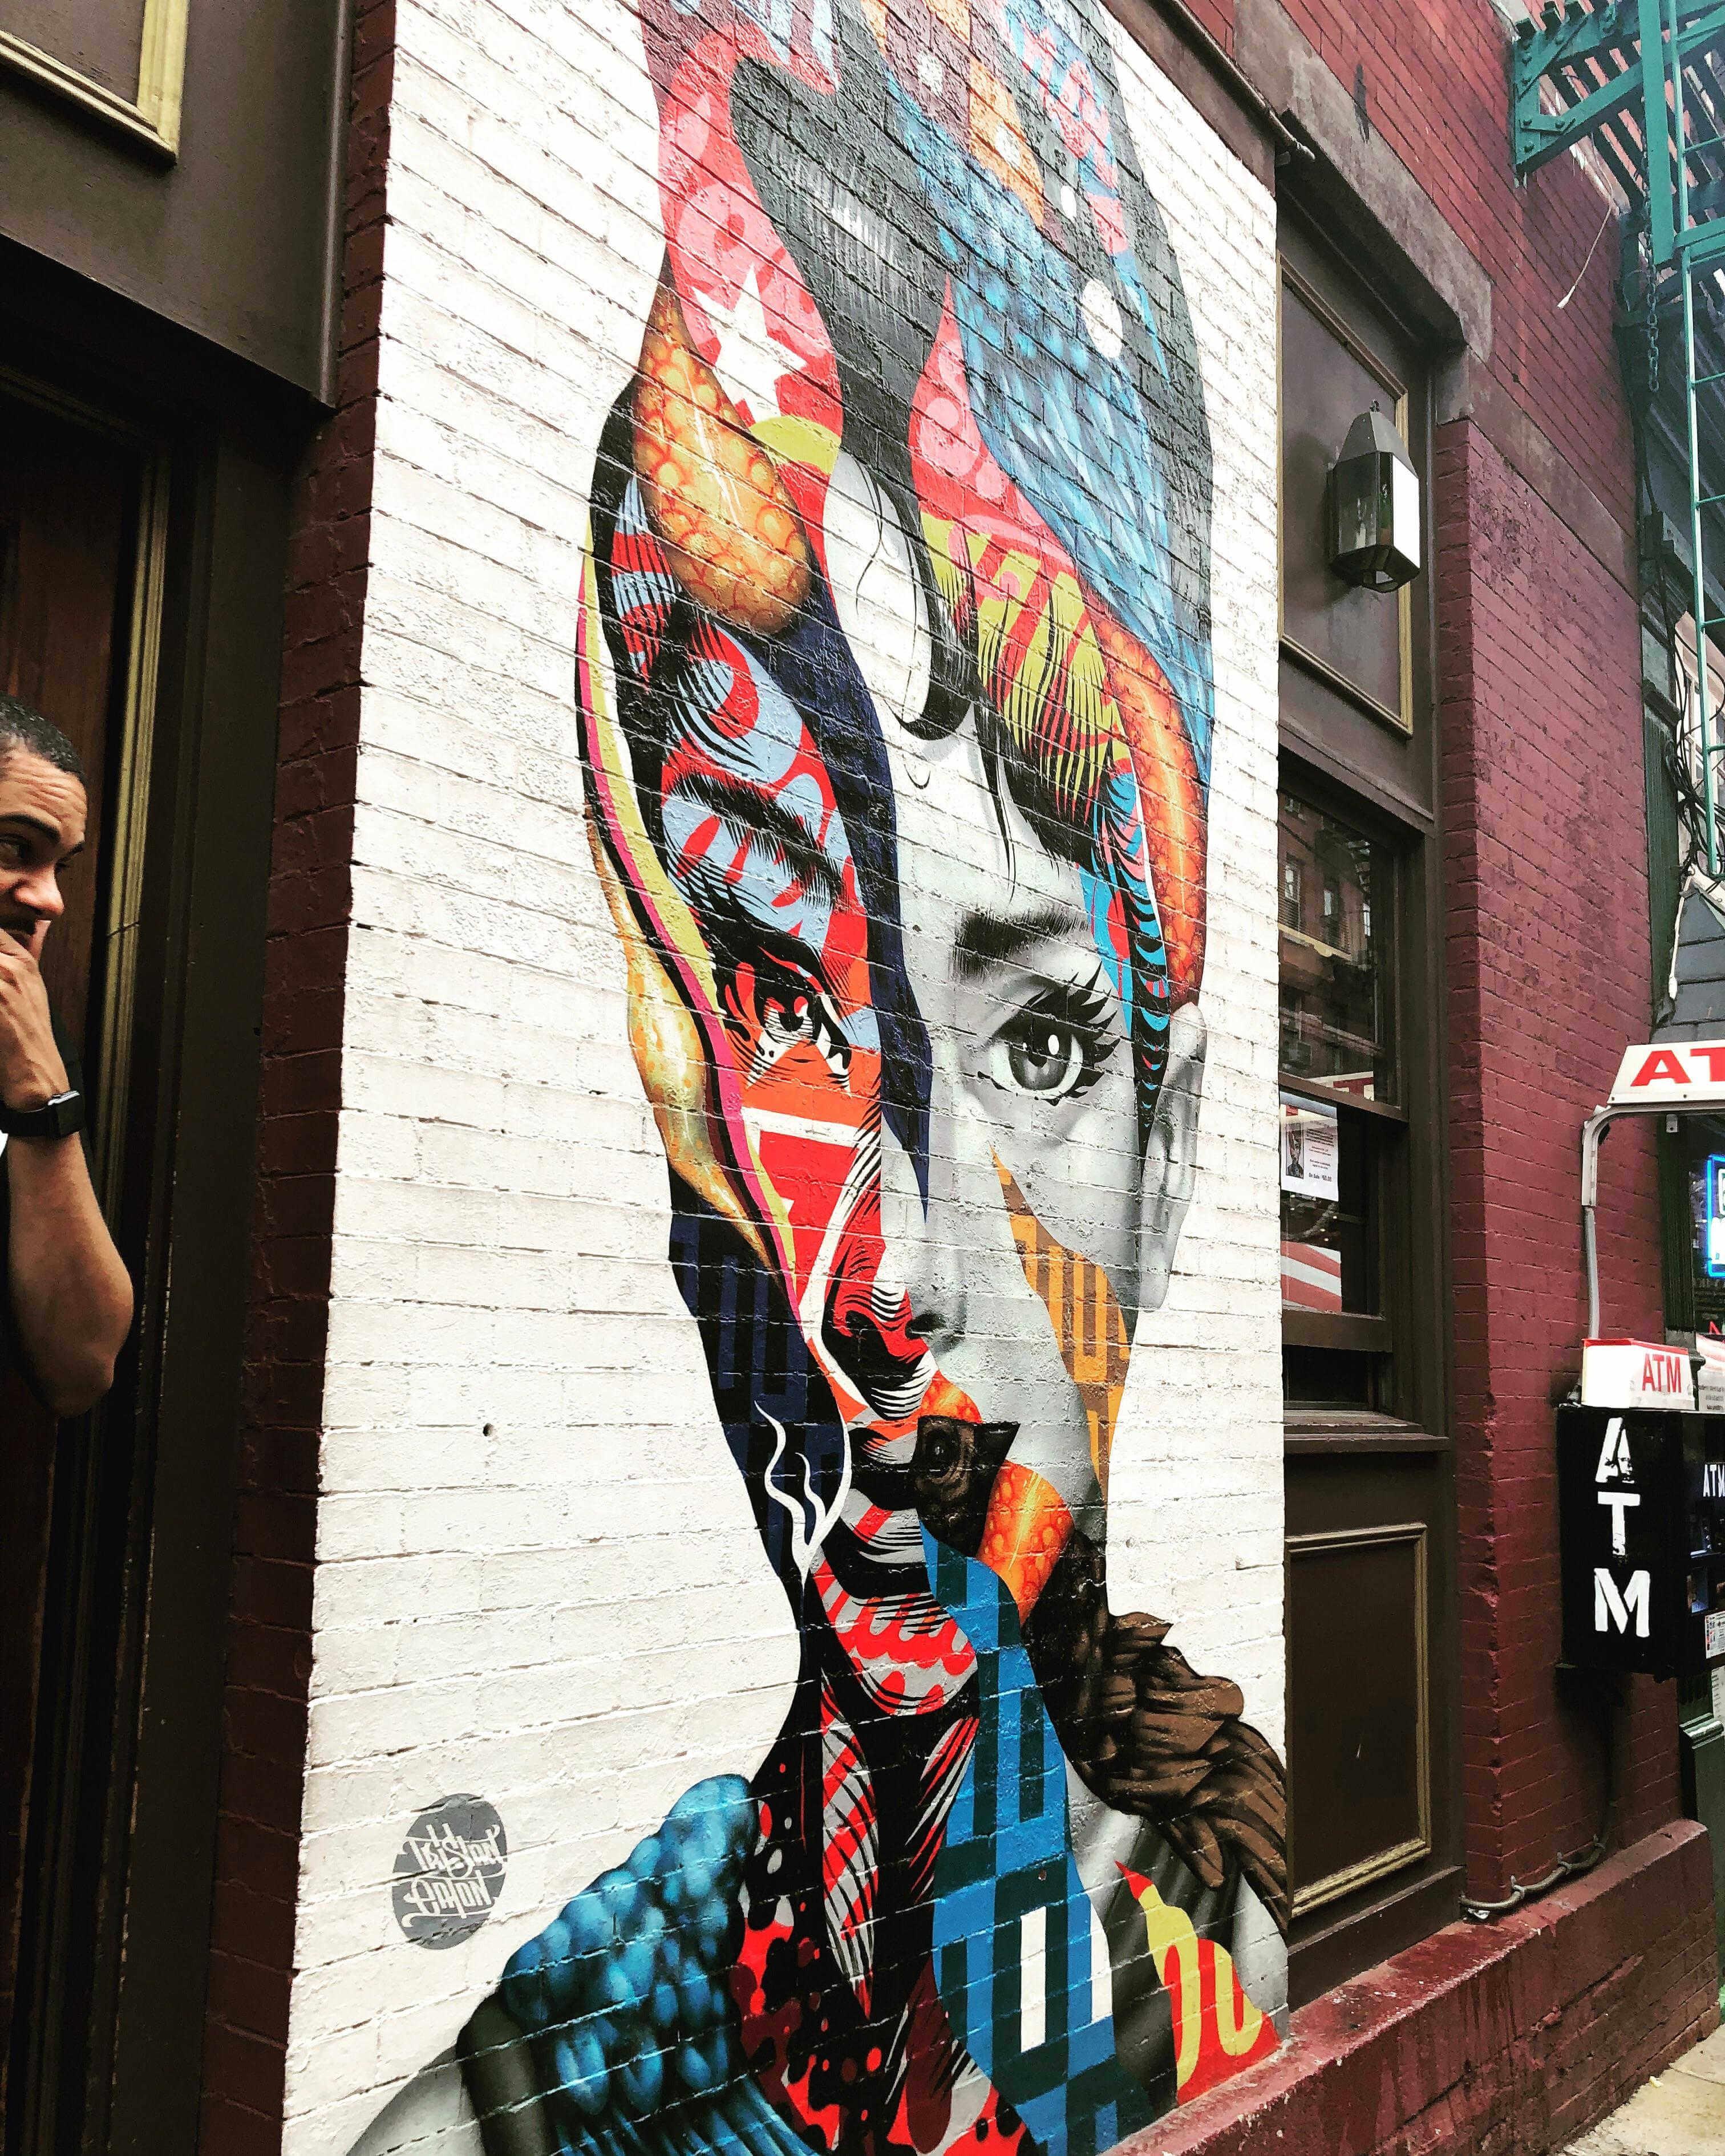 katharine hepburn en little italy de new york por Tristan Eaton